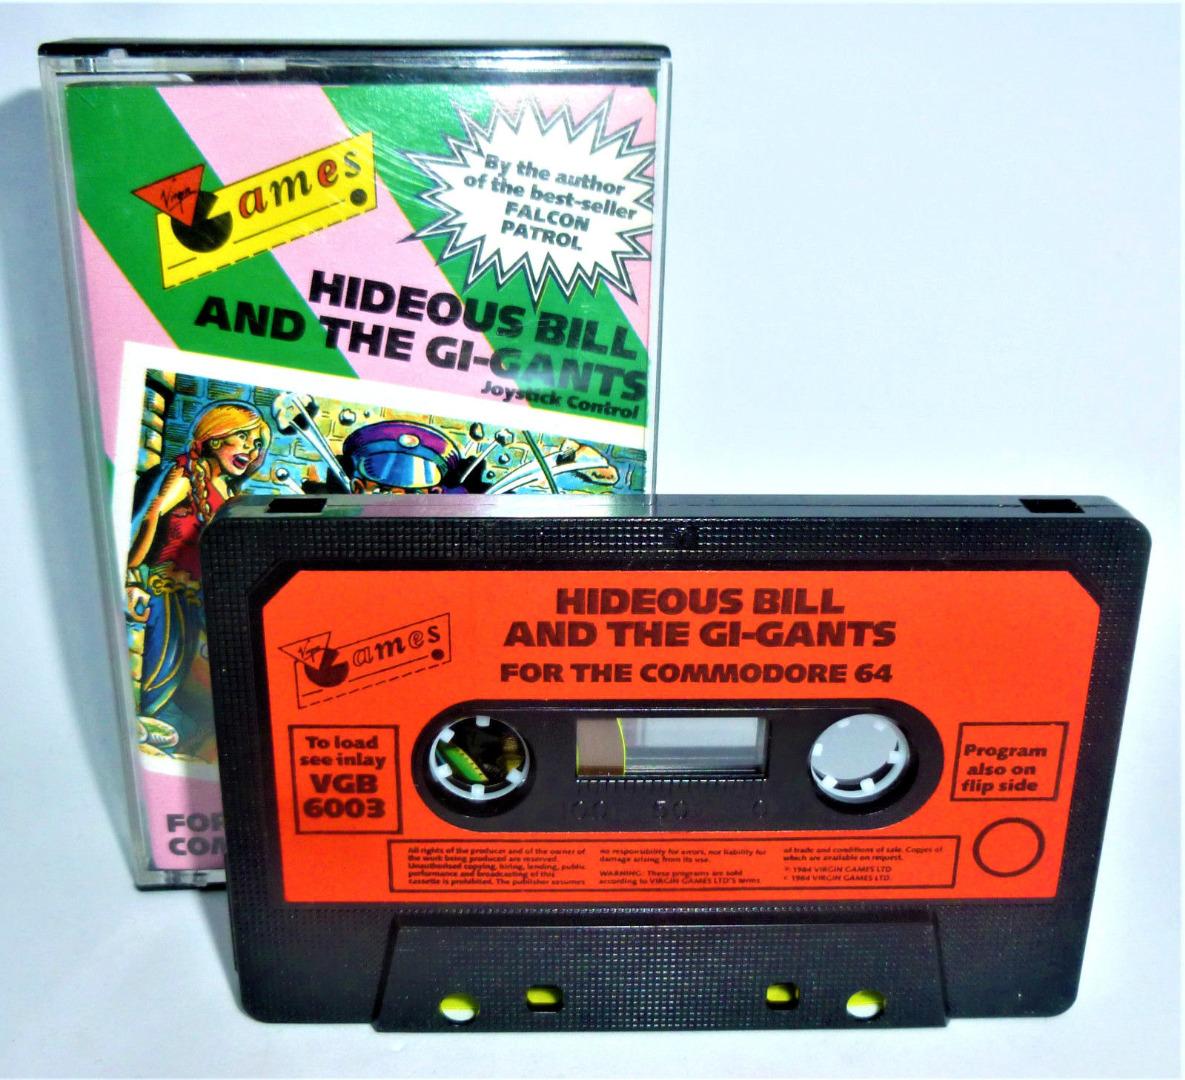 C64 Hideous Bill and the Gi-Gants